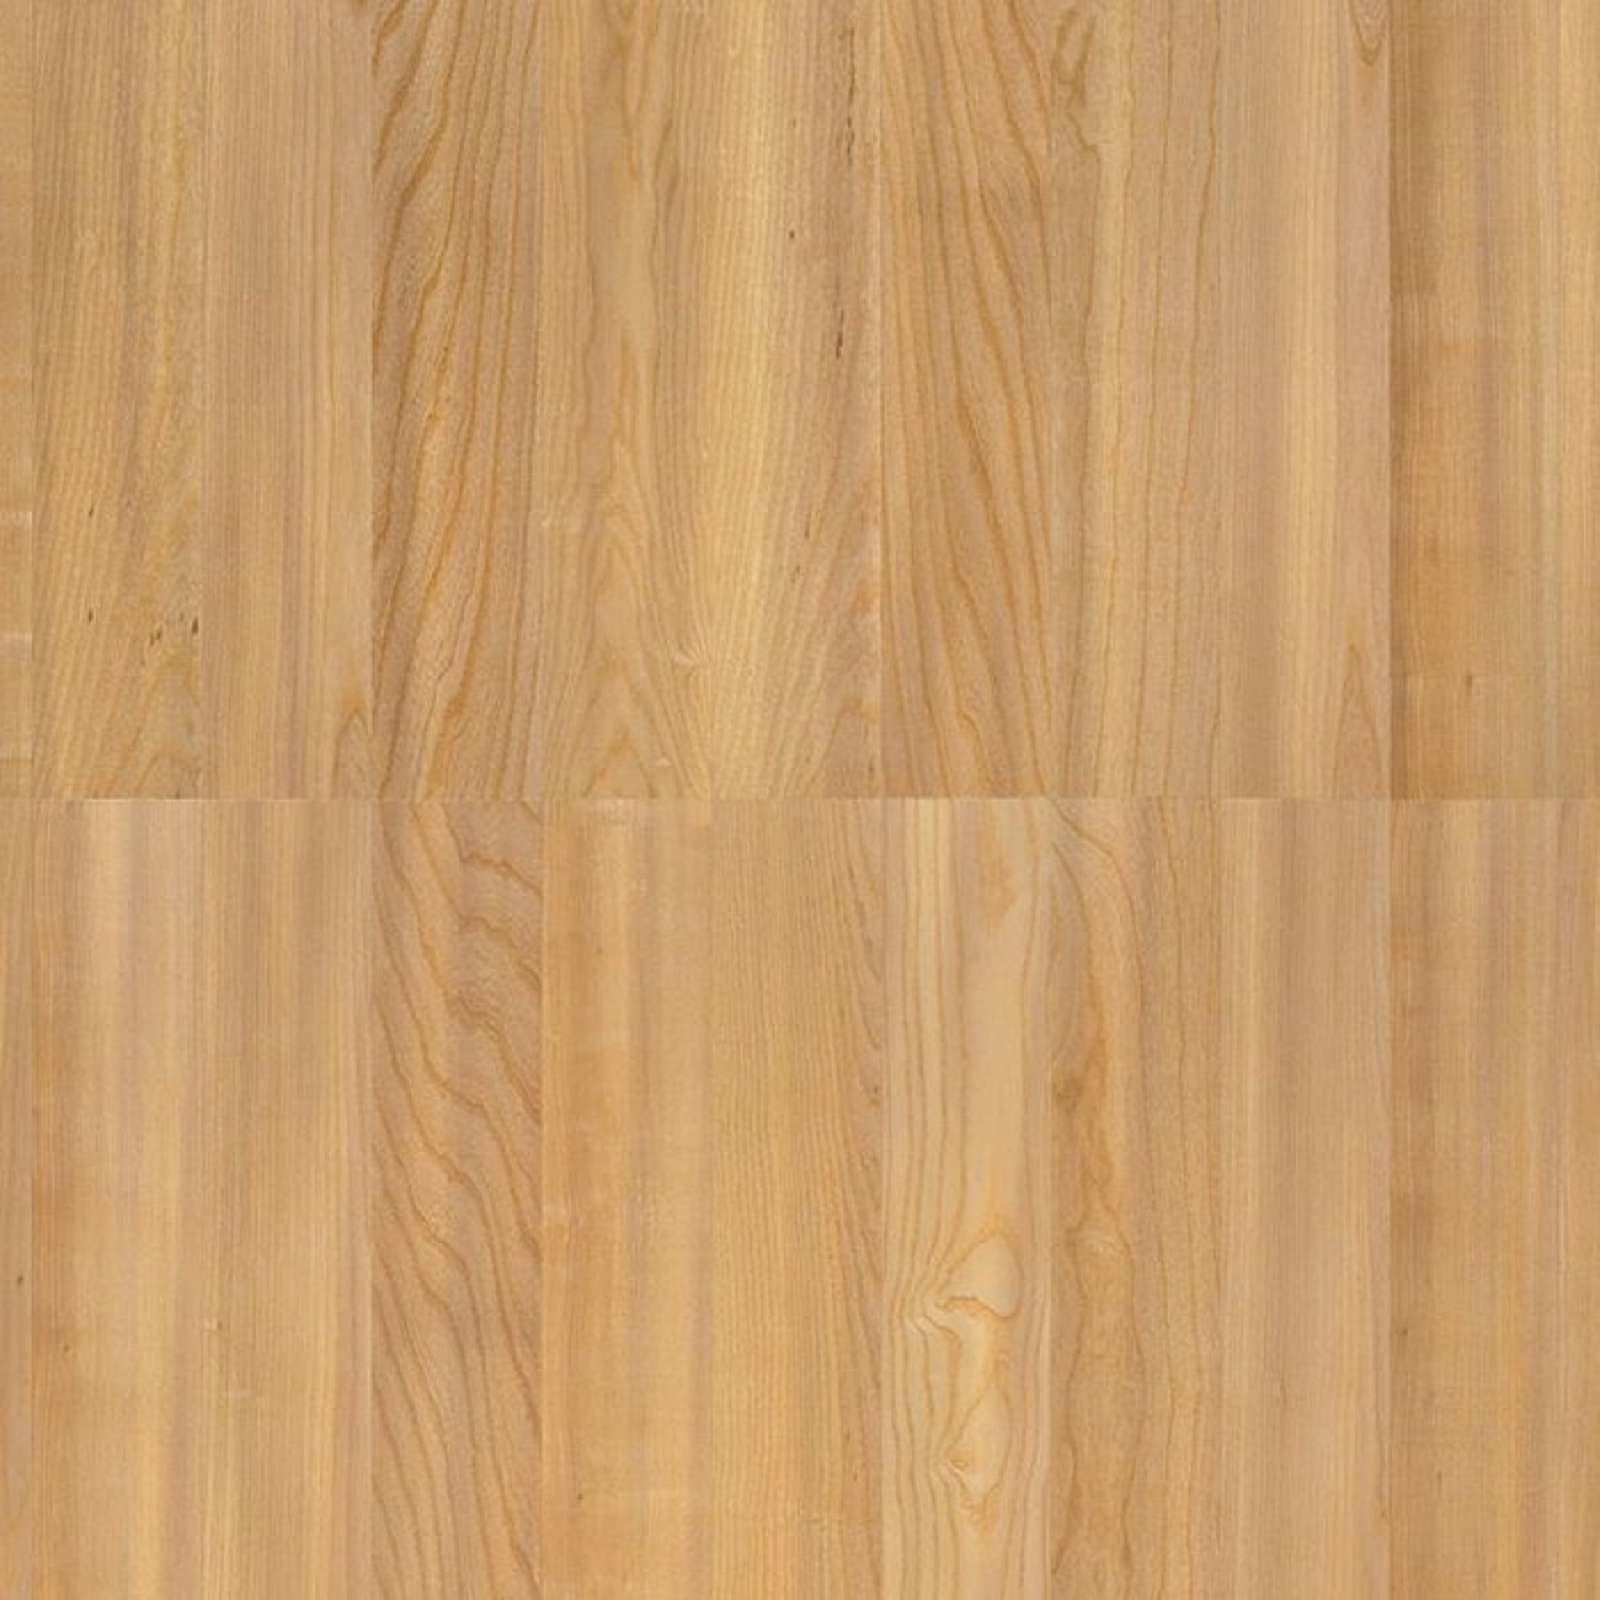 Паркет Tarkett Rumba Ясень Морской, 550048015, 1200х120х14, (6 шт упак \0.86)